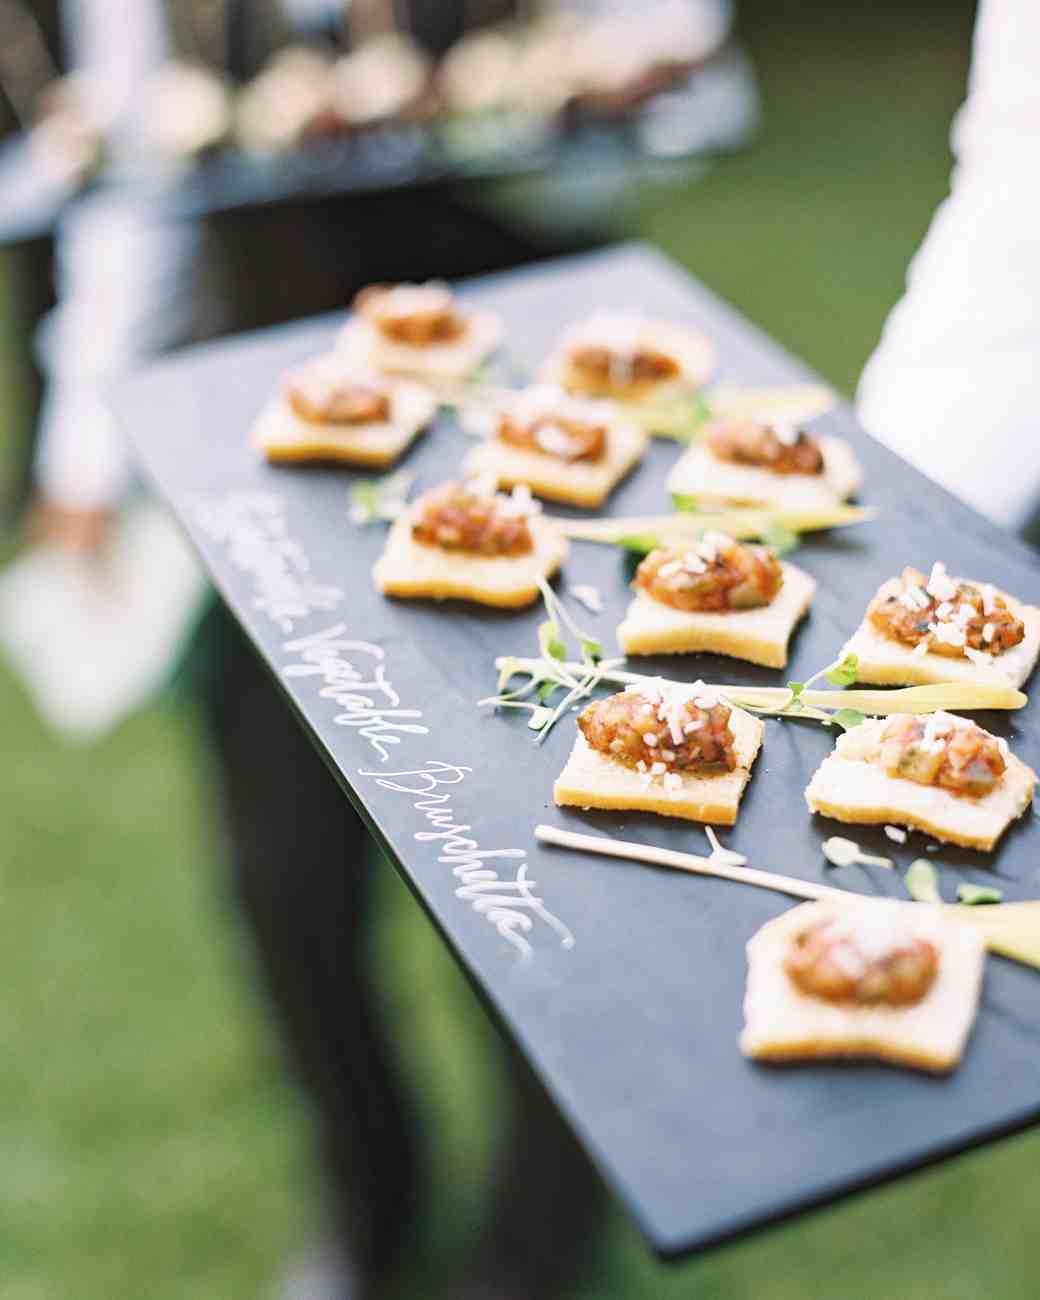 taylor-john-wedding-appetizers-d11-s113035-0616.jpg